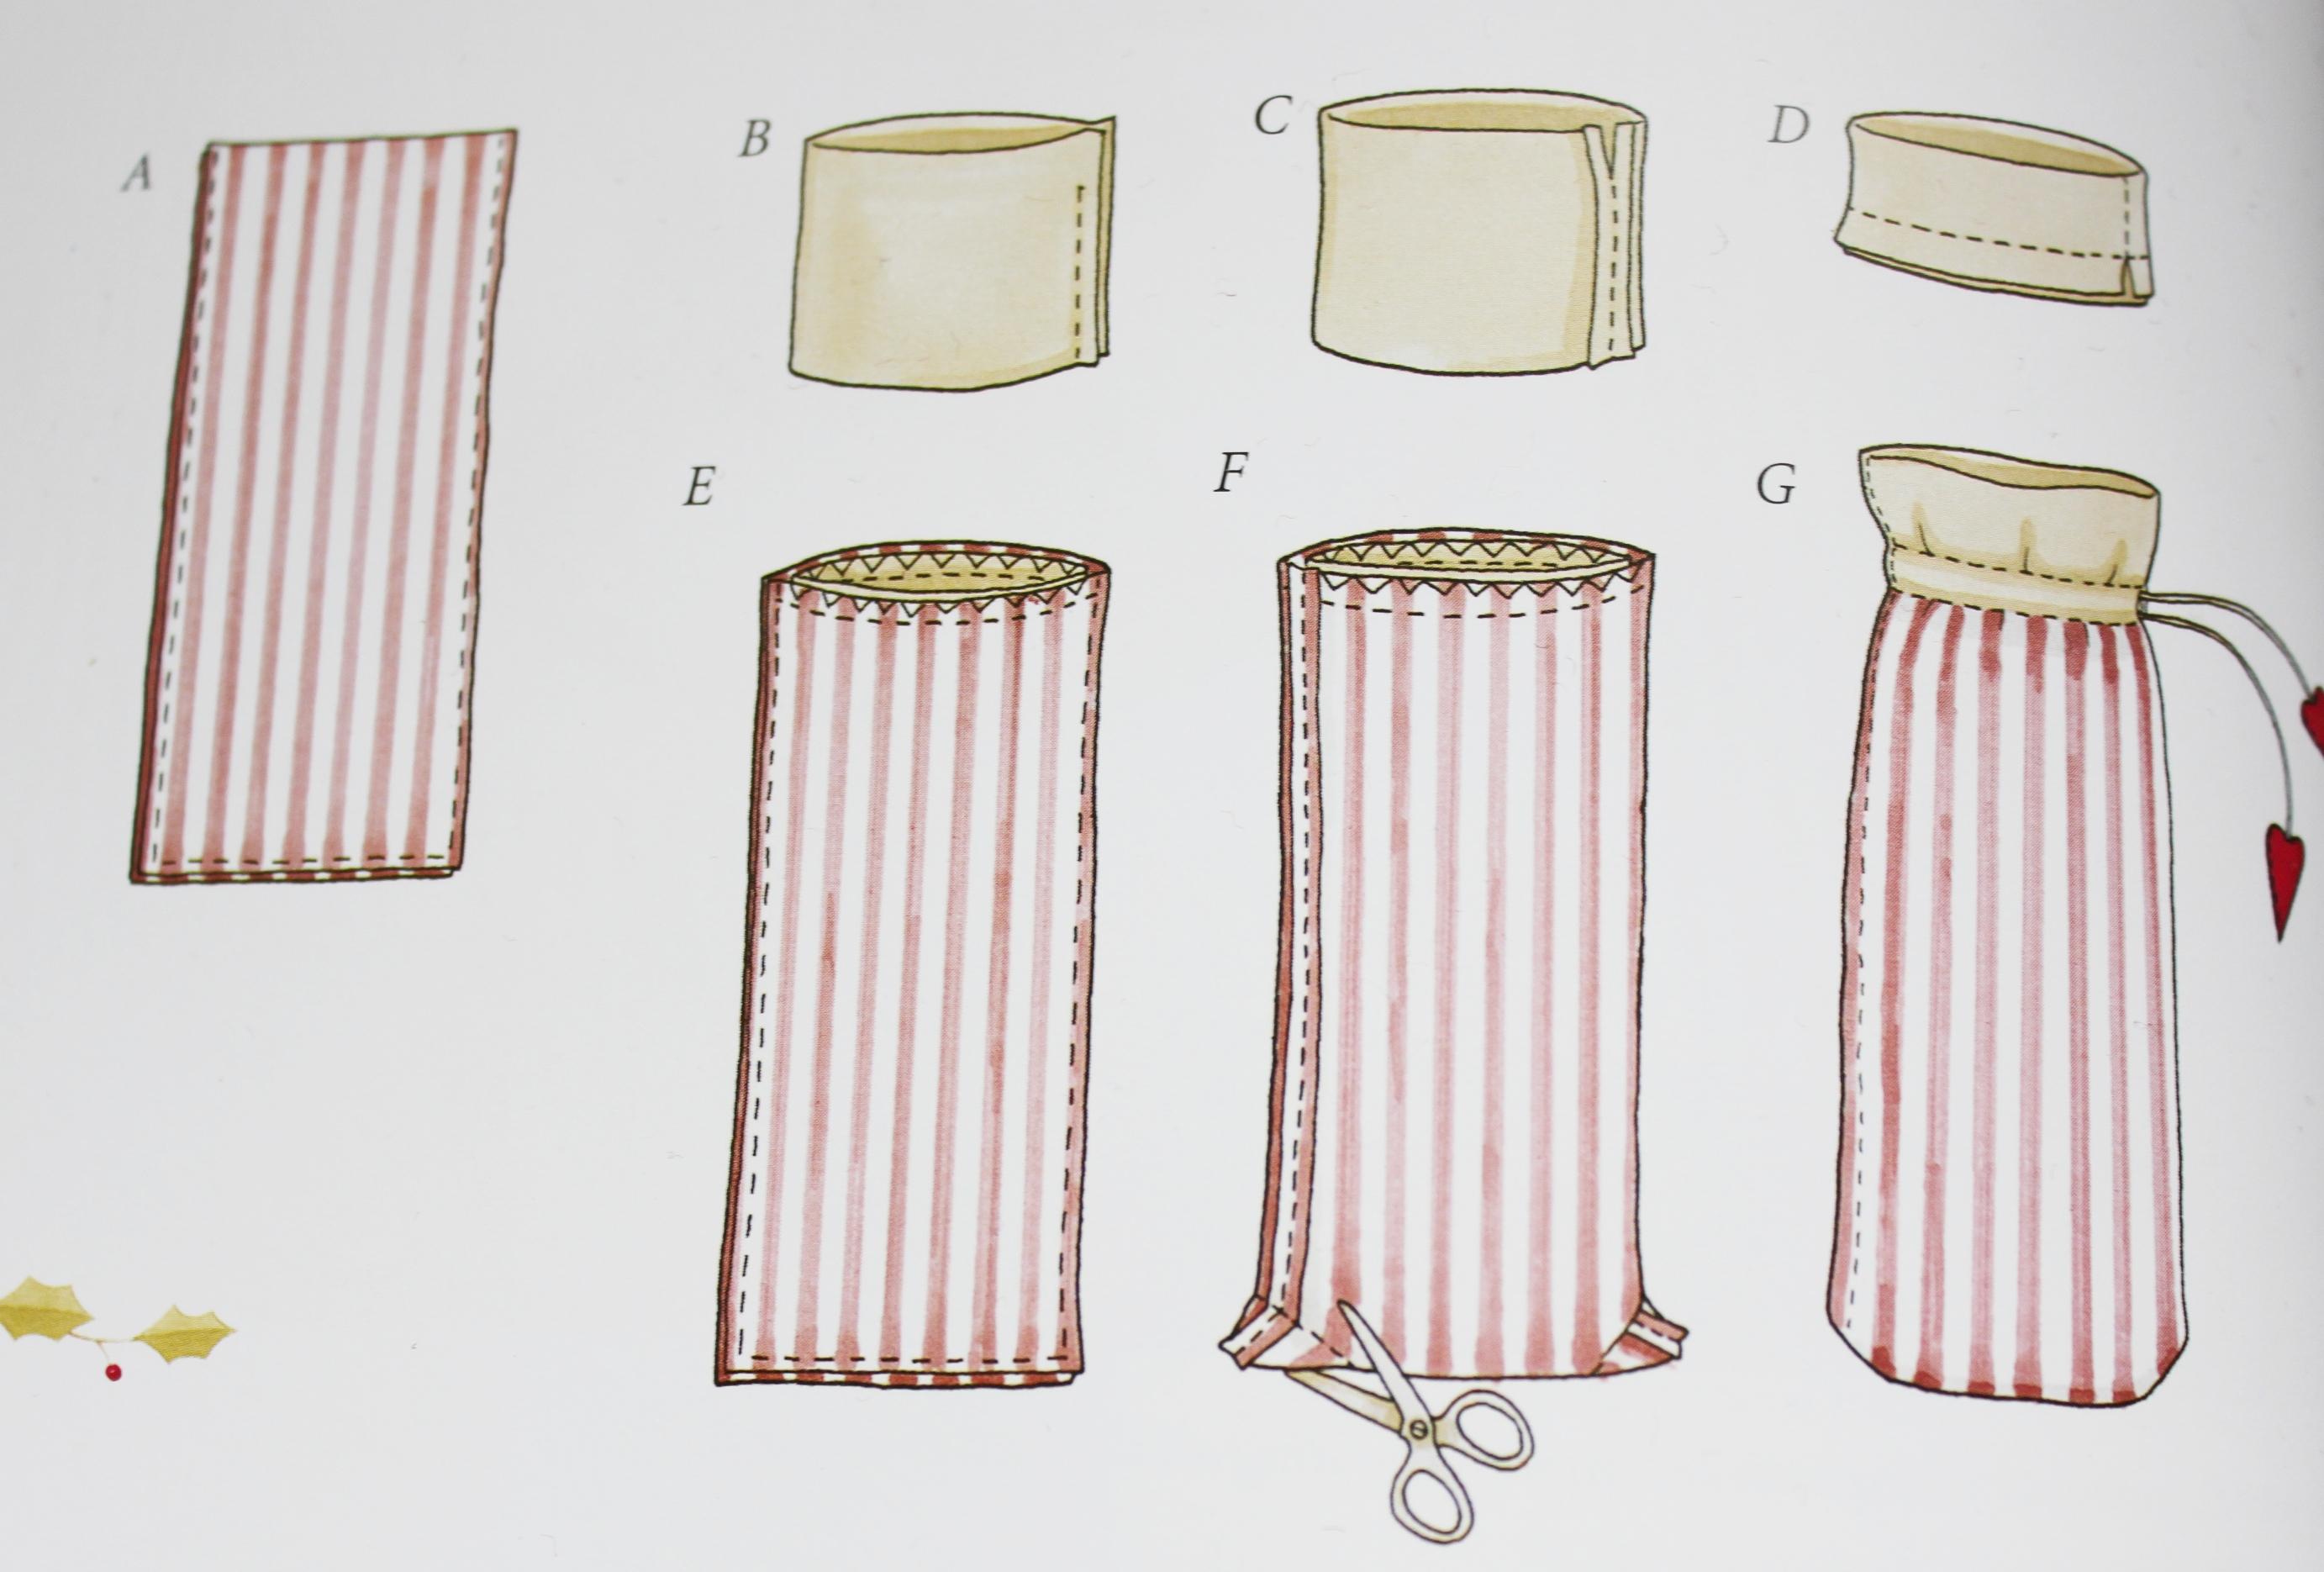 Christmas Gift Ideas To Sew - rjmovers.com